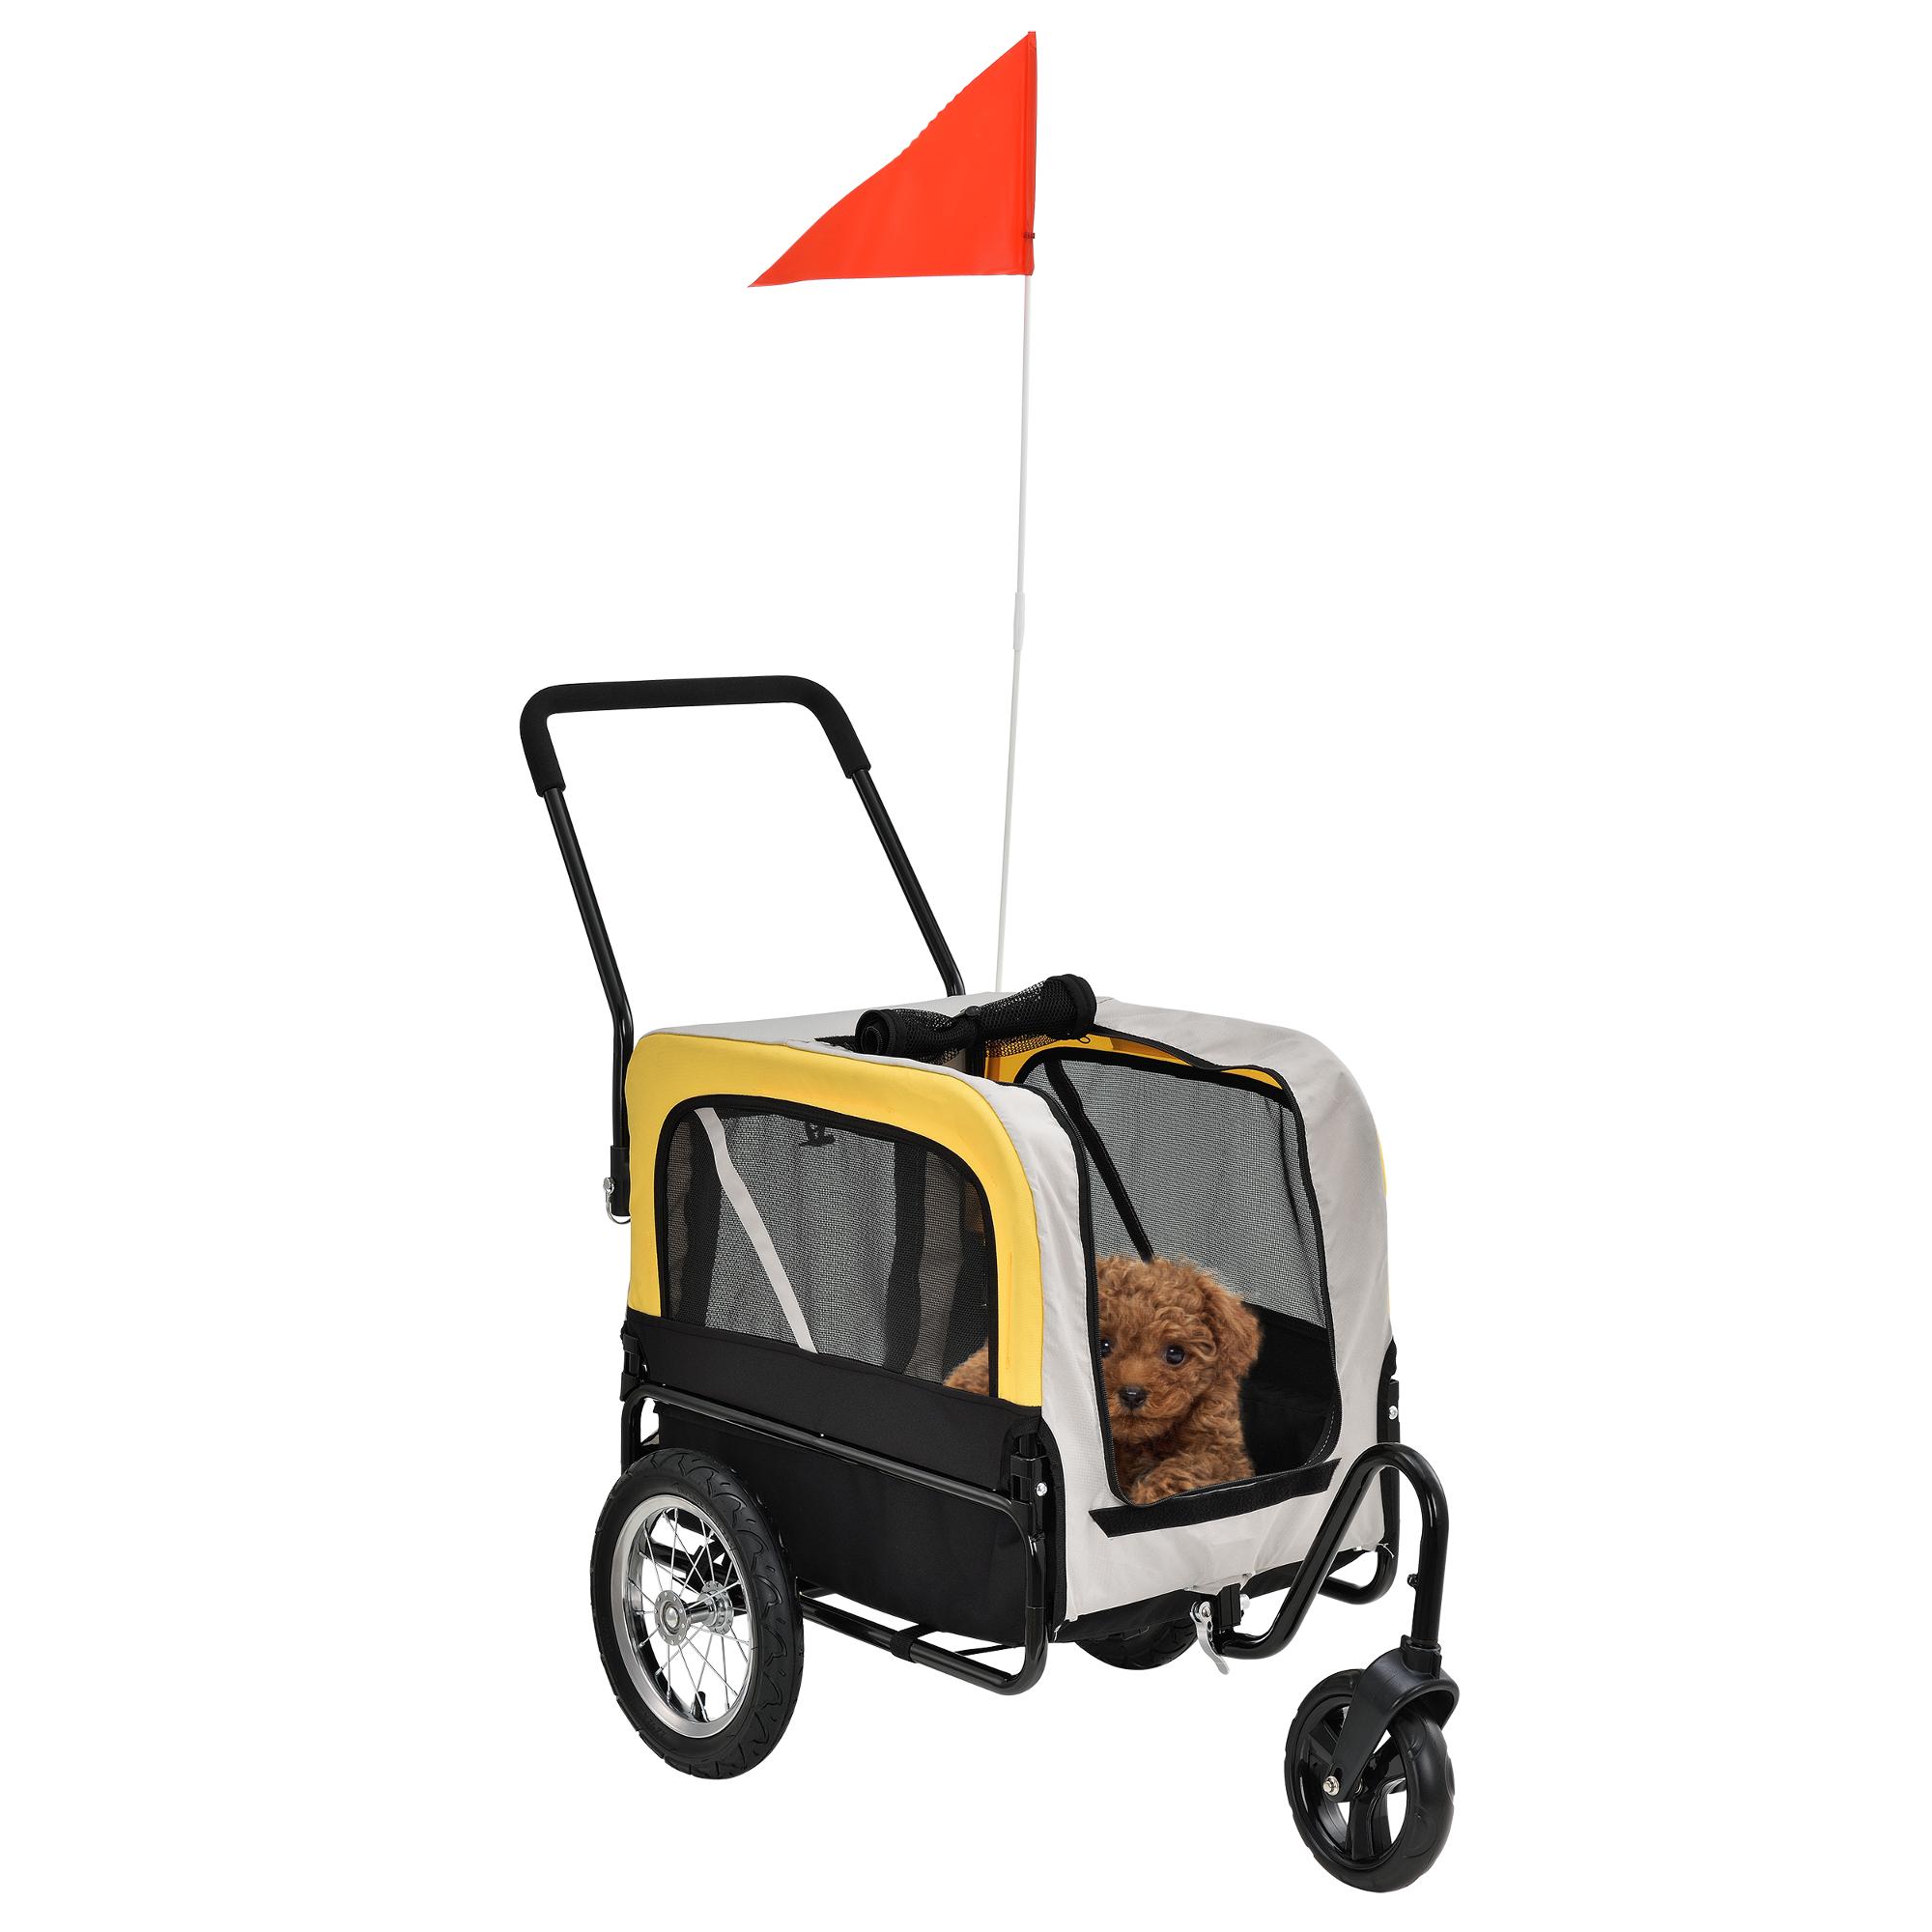 [pro.tec]® Vozík za kolo - kočárek - 2 v 1 - do 25 kg - 107 x 56 x 97 cm